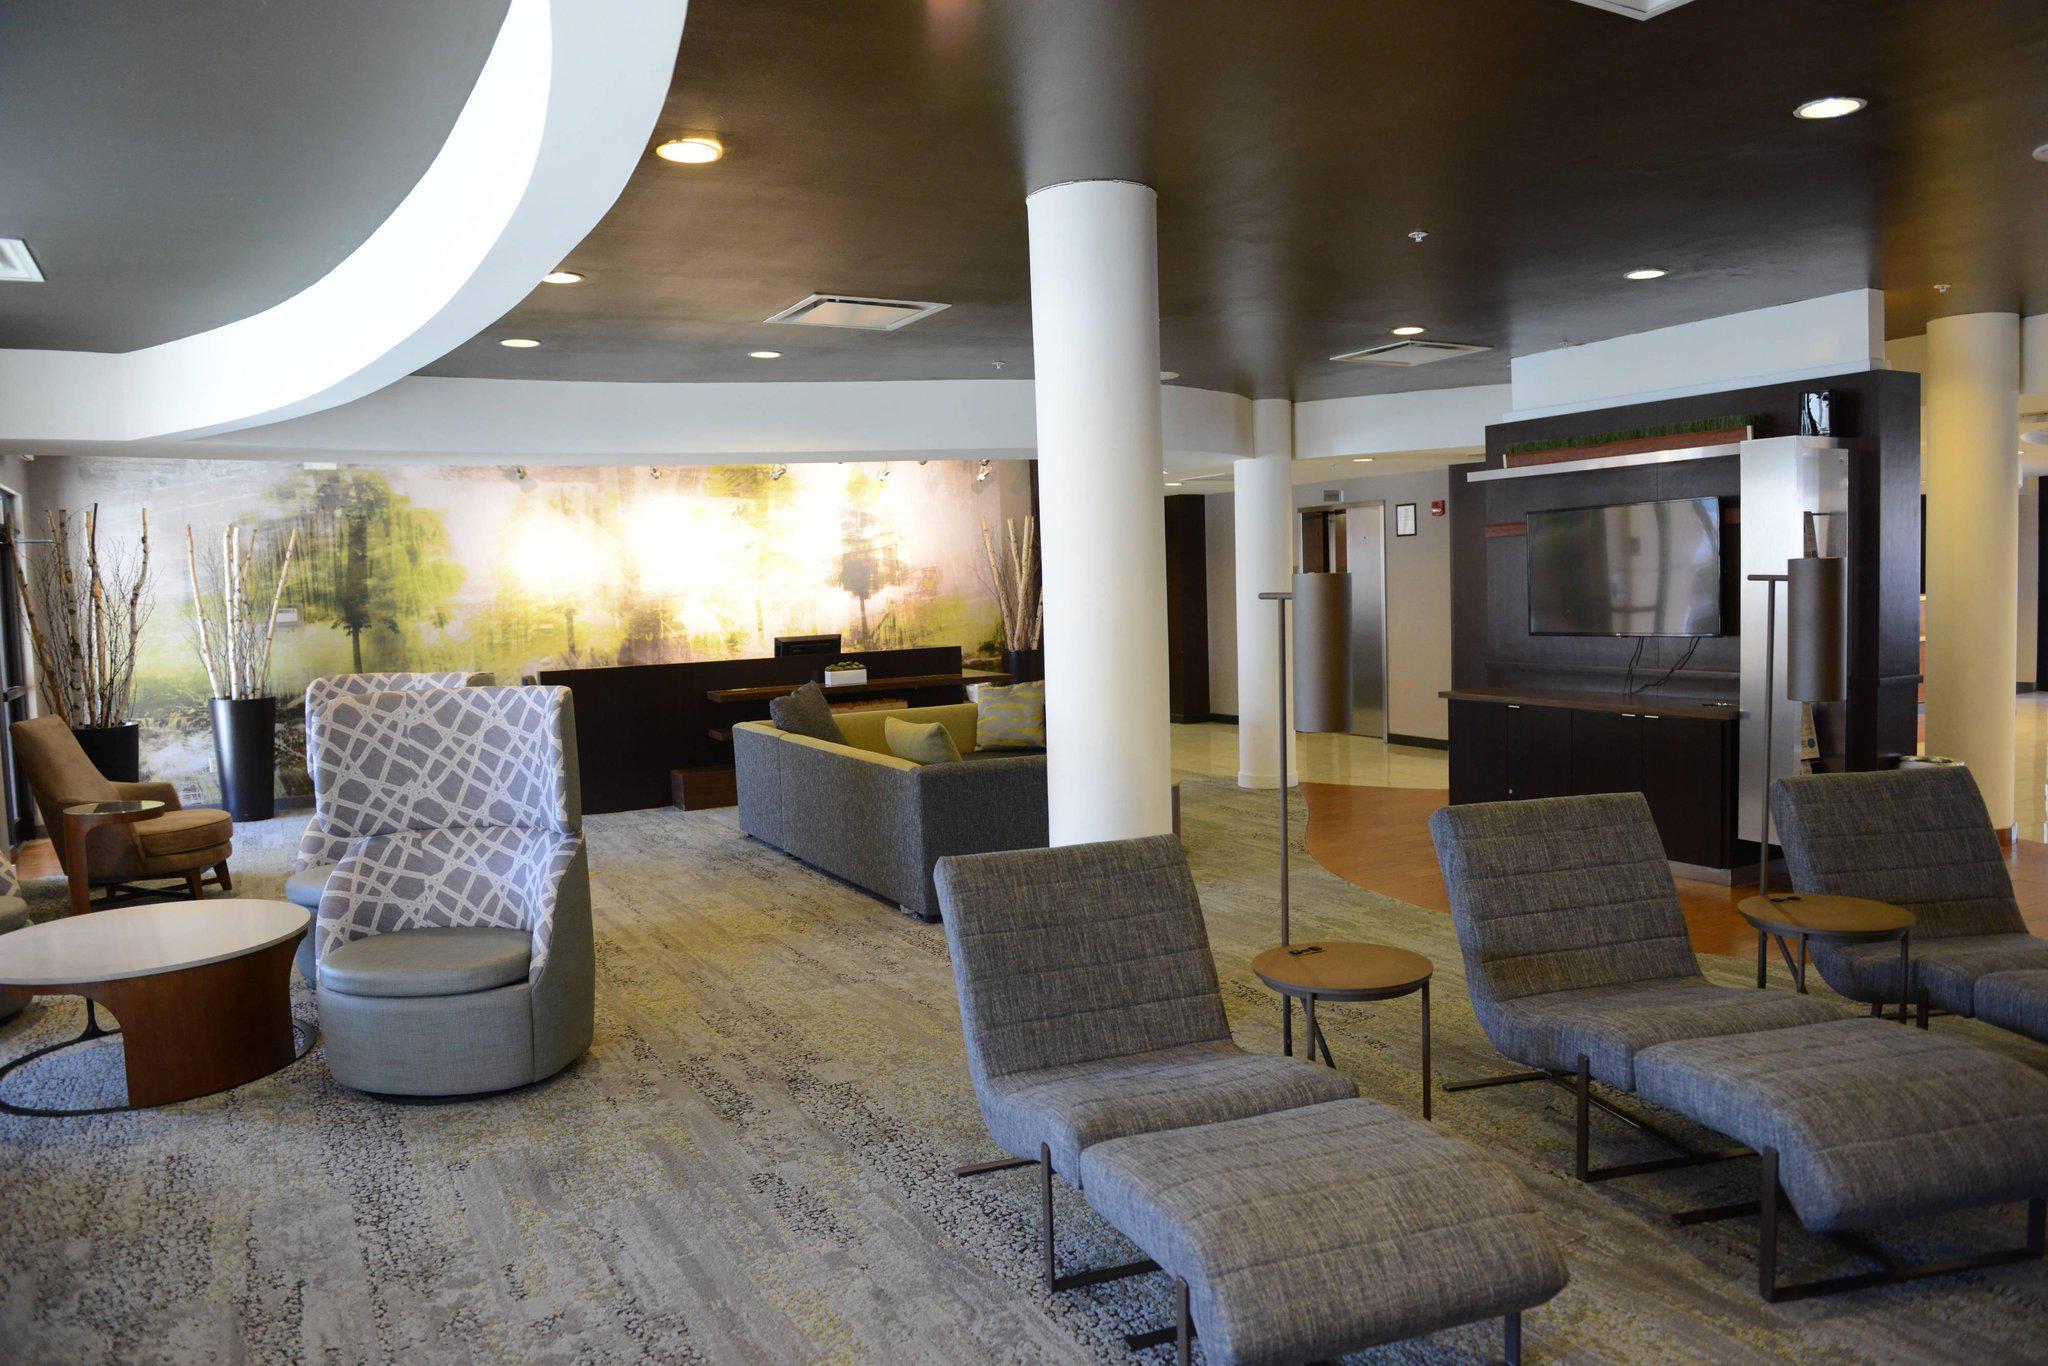 Courtyard by Marriott El Paso Airport